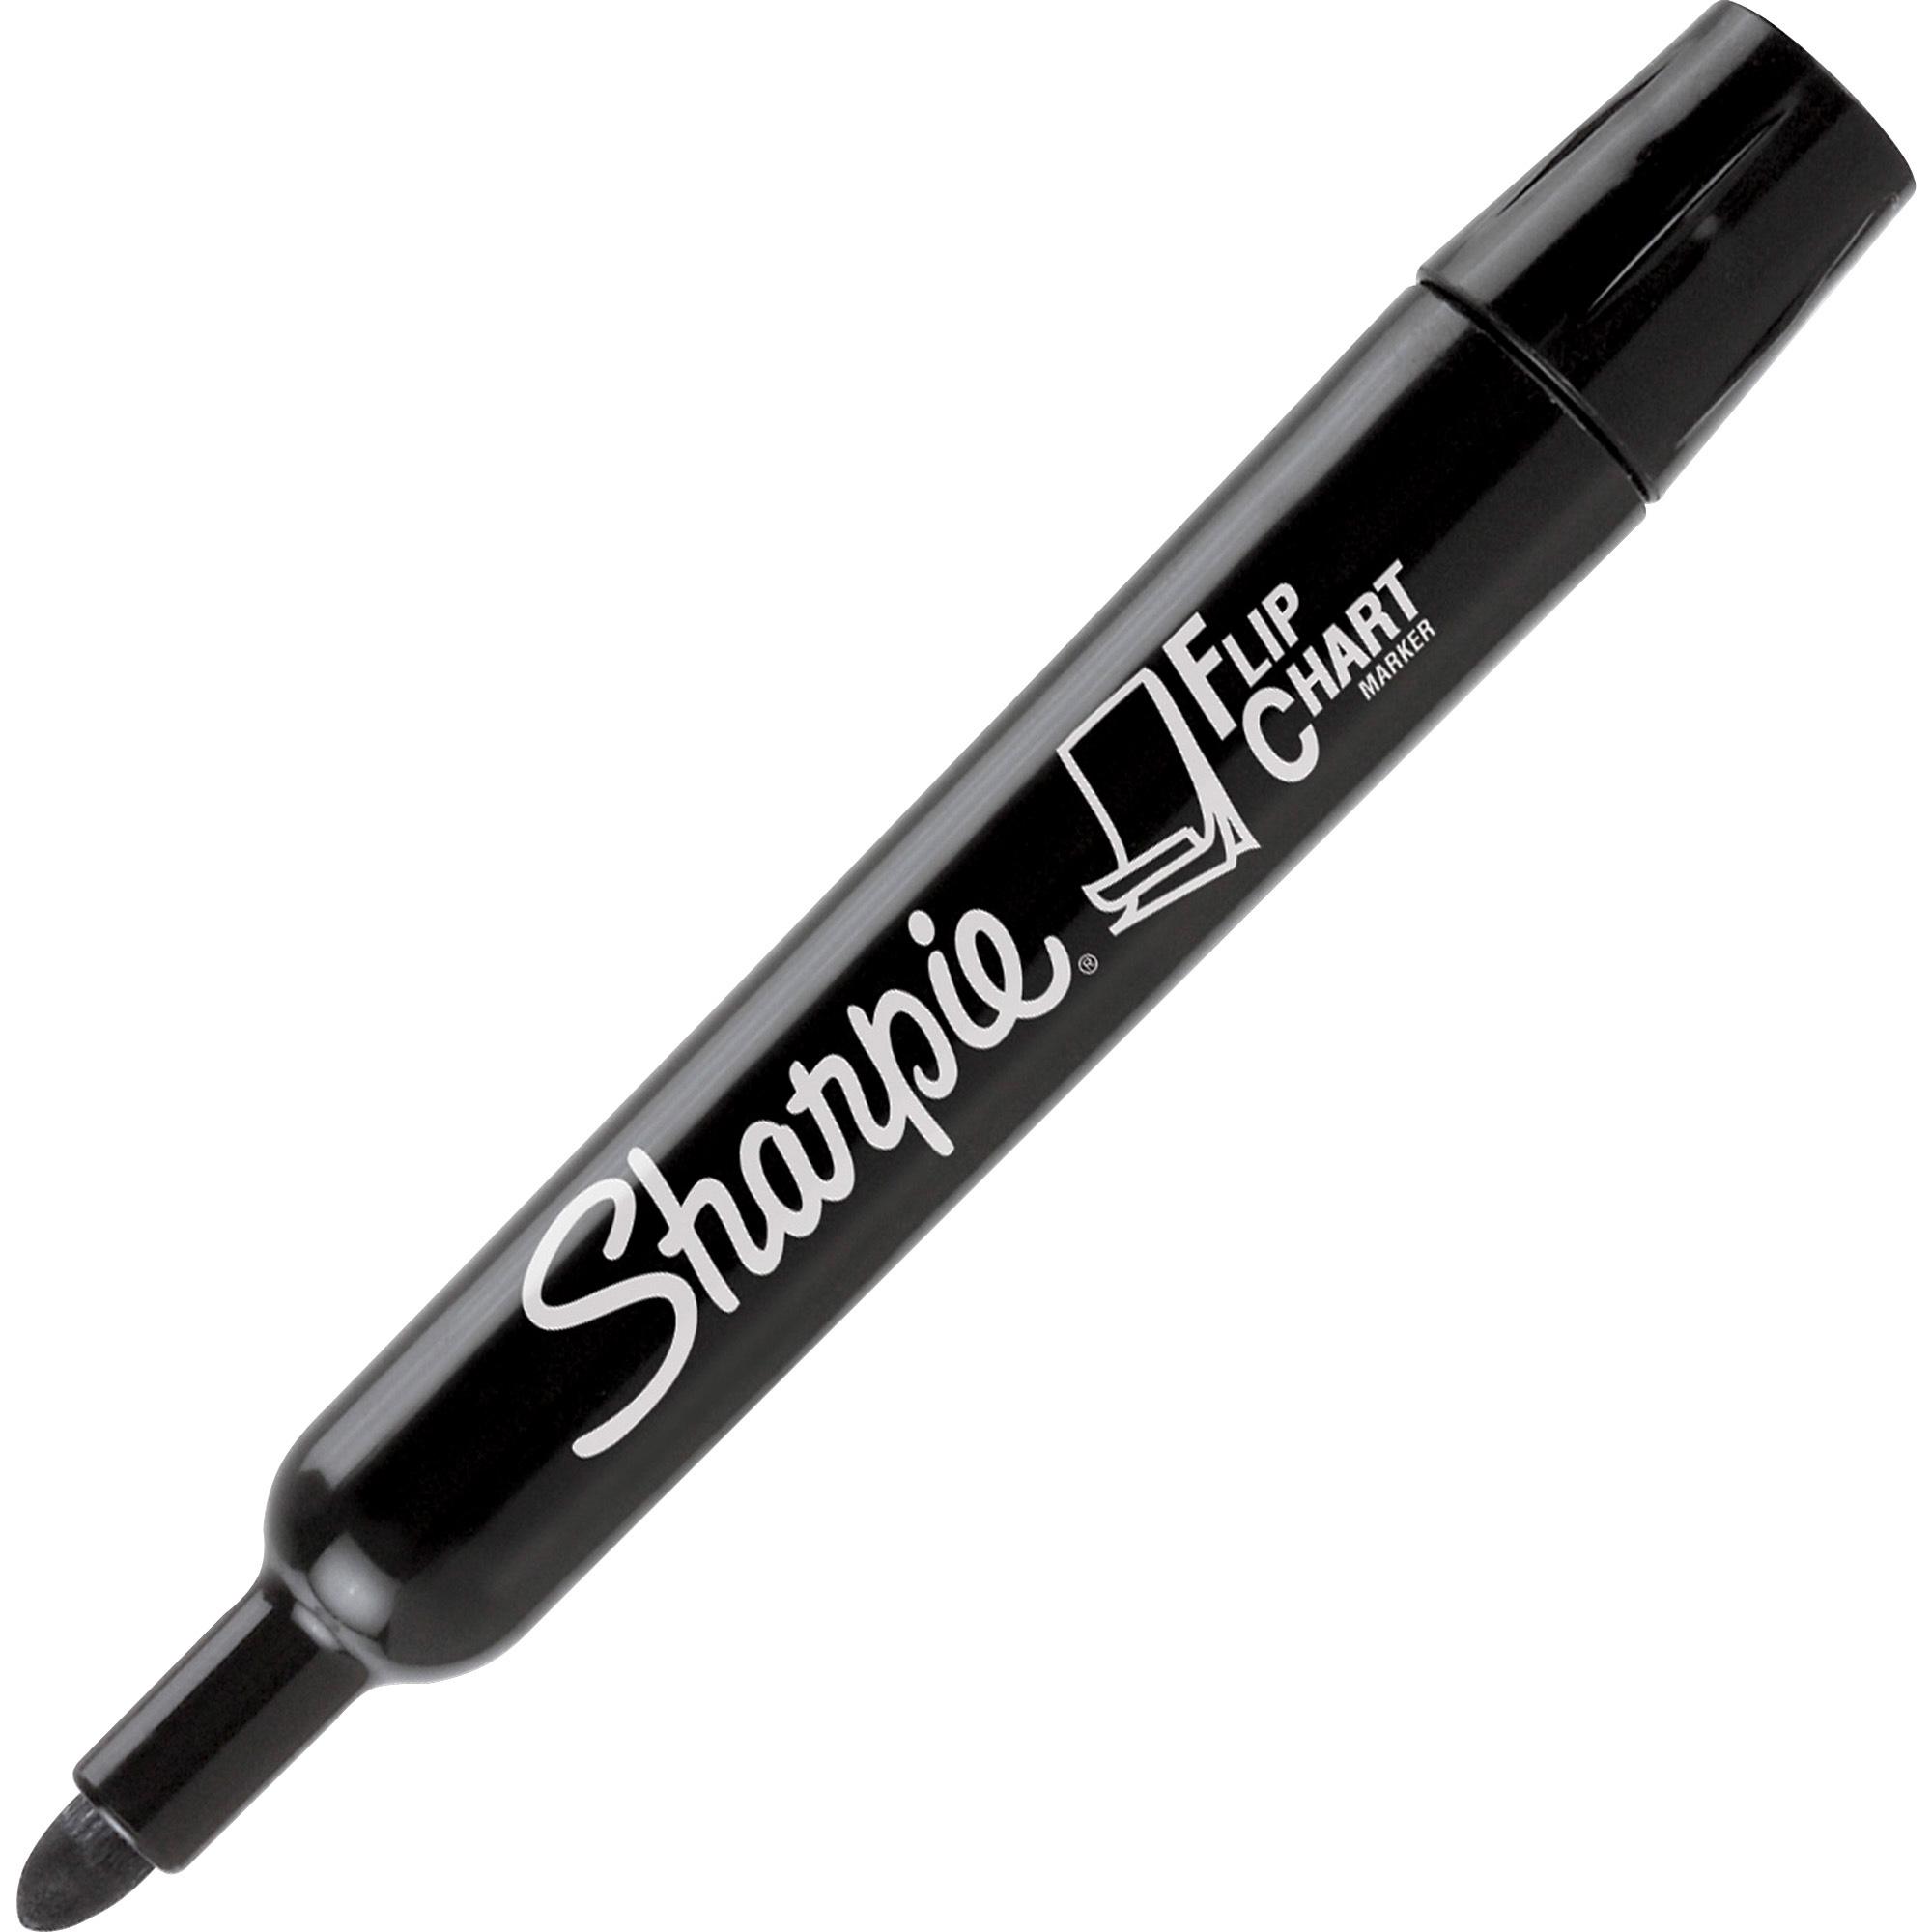 Bullet Tip Sharpie 22478 Flip Chart Markers Assorted Colors